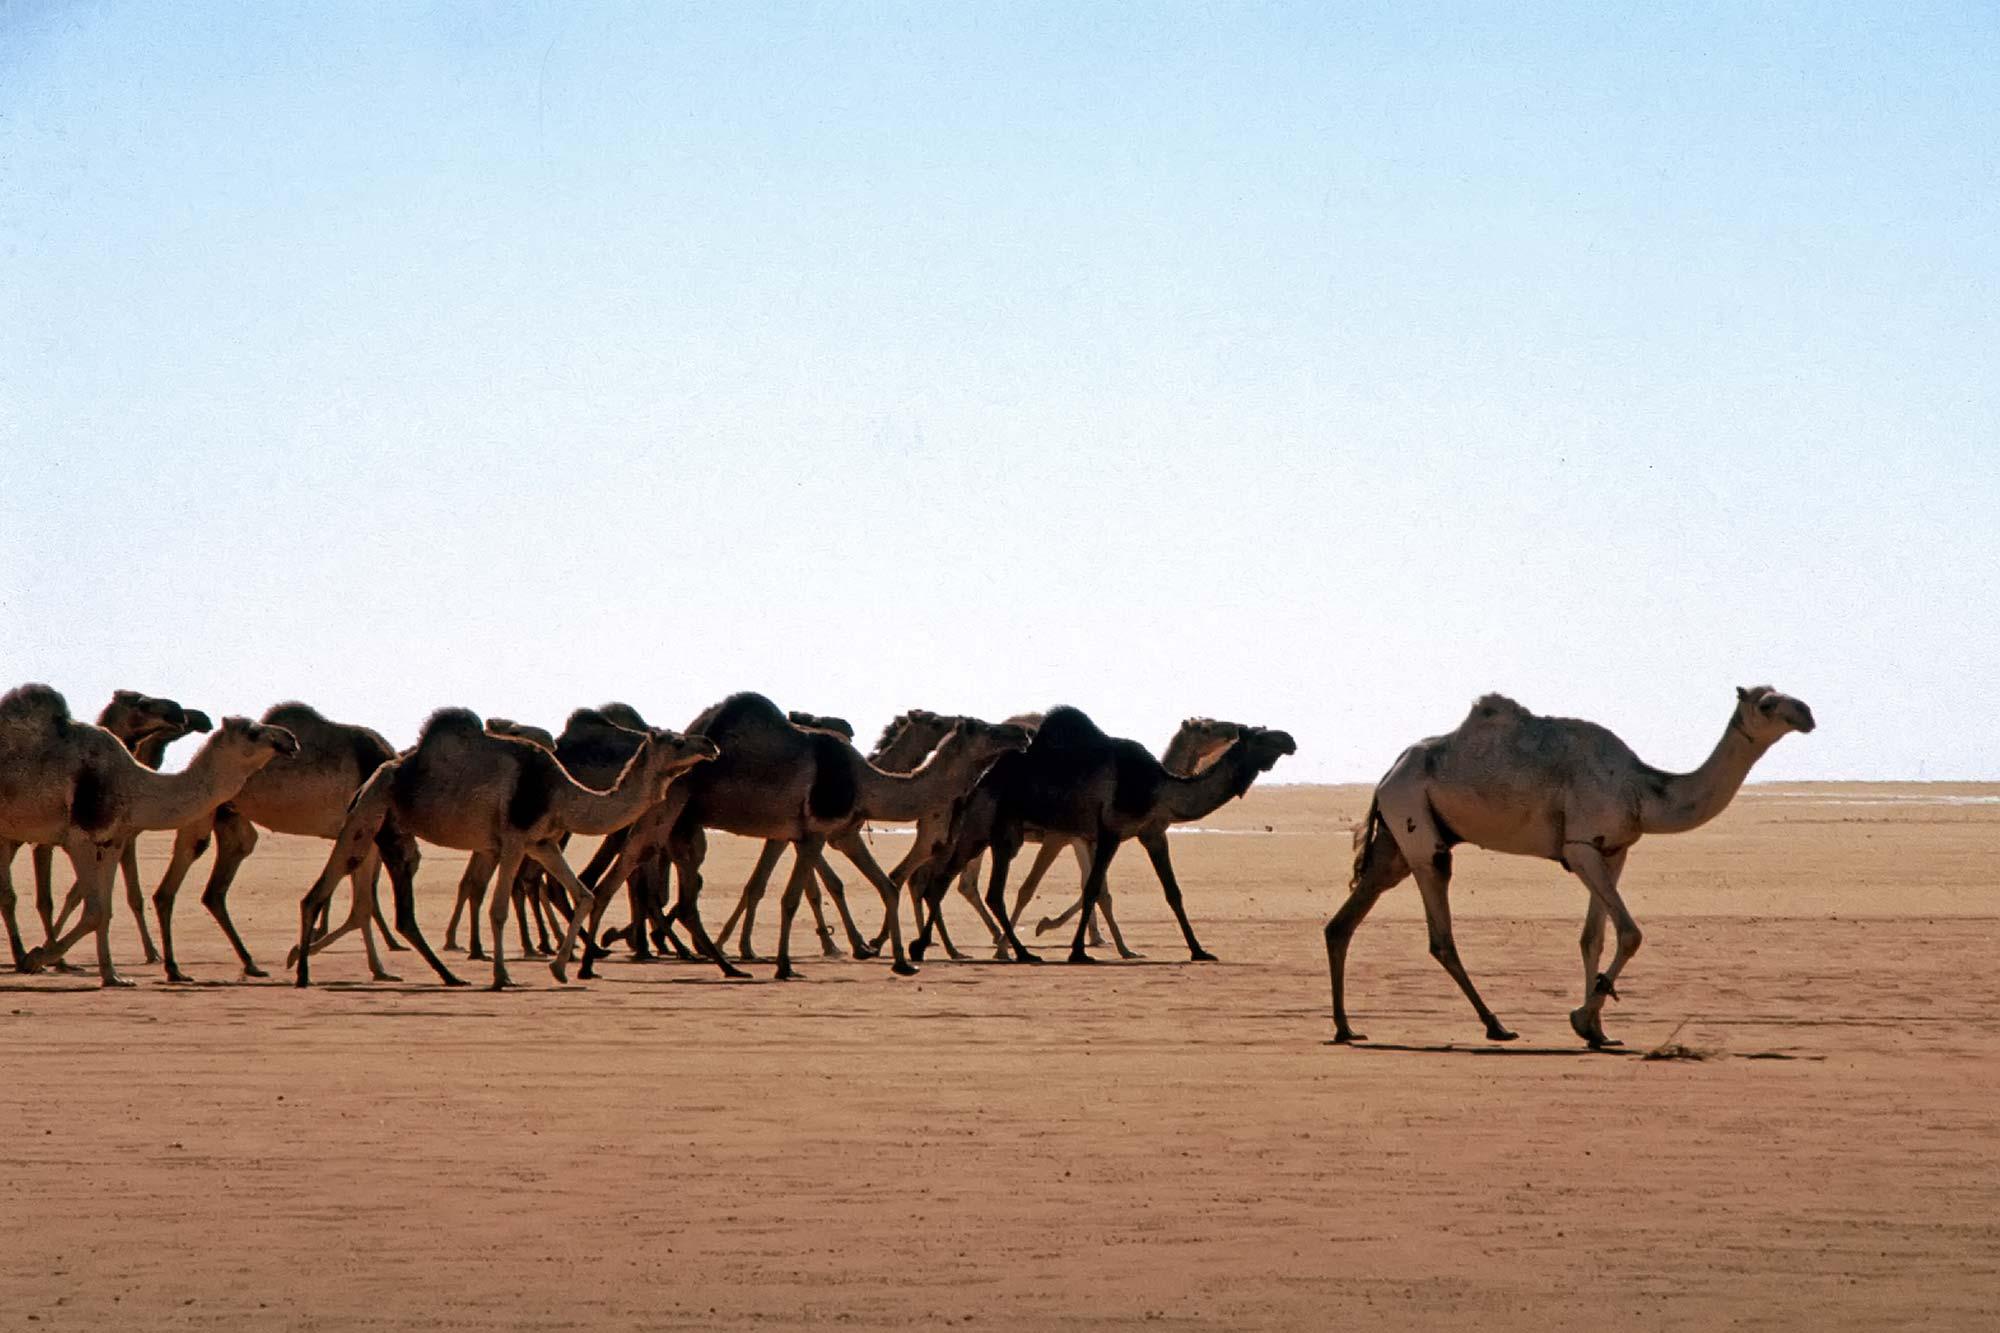 camel-caravan-desert-africa